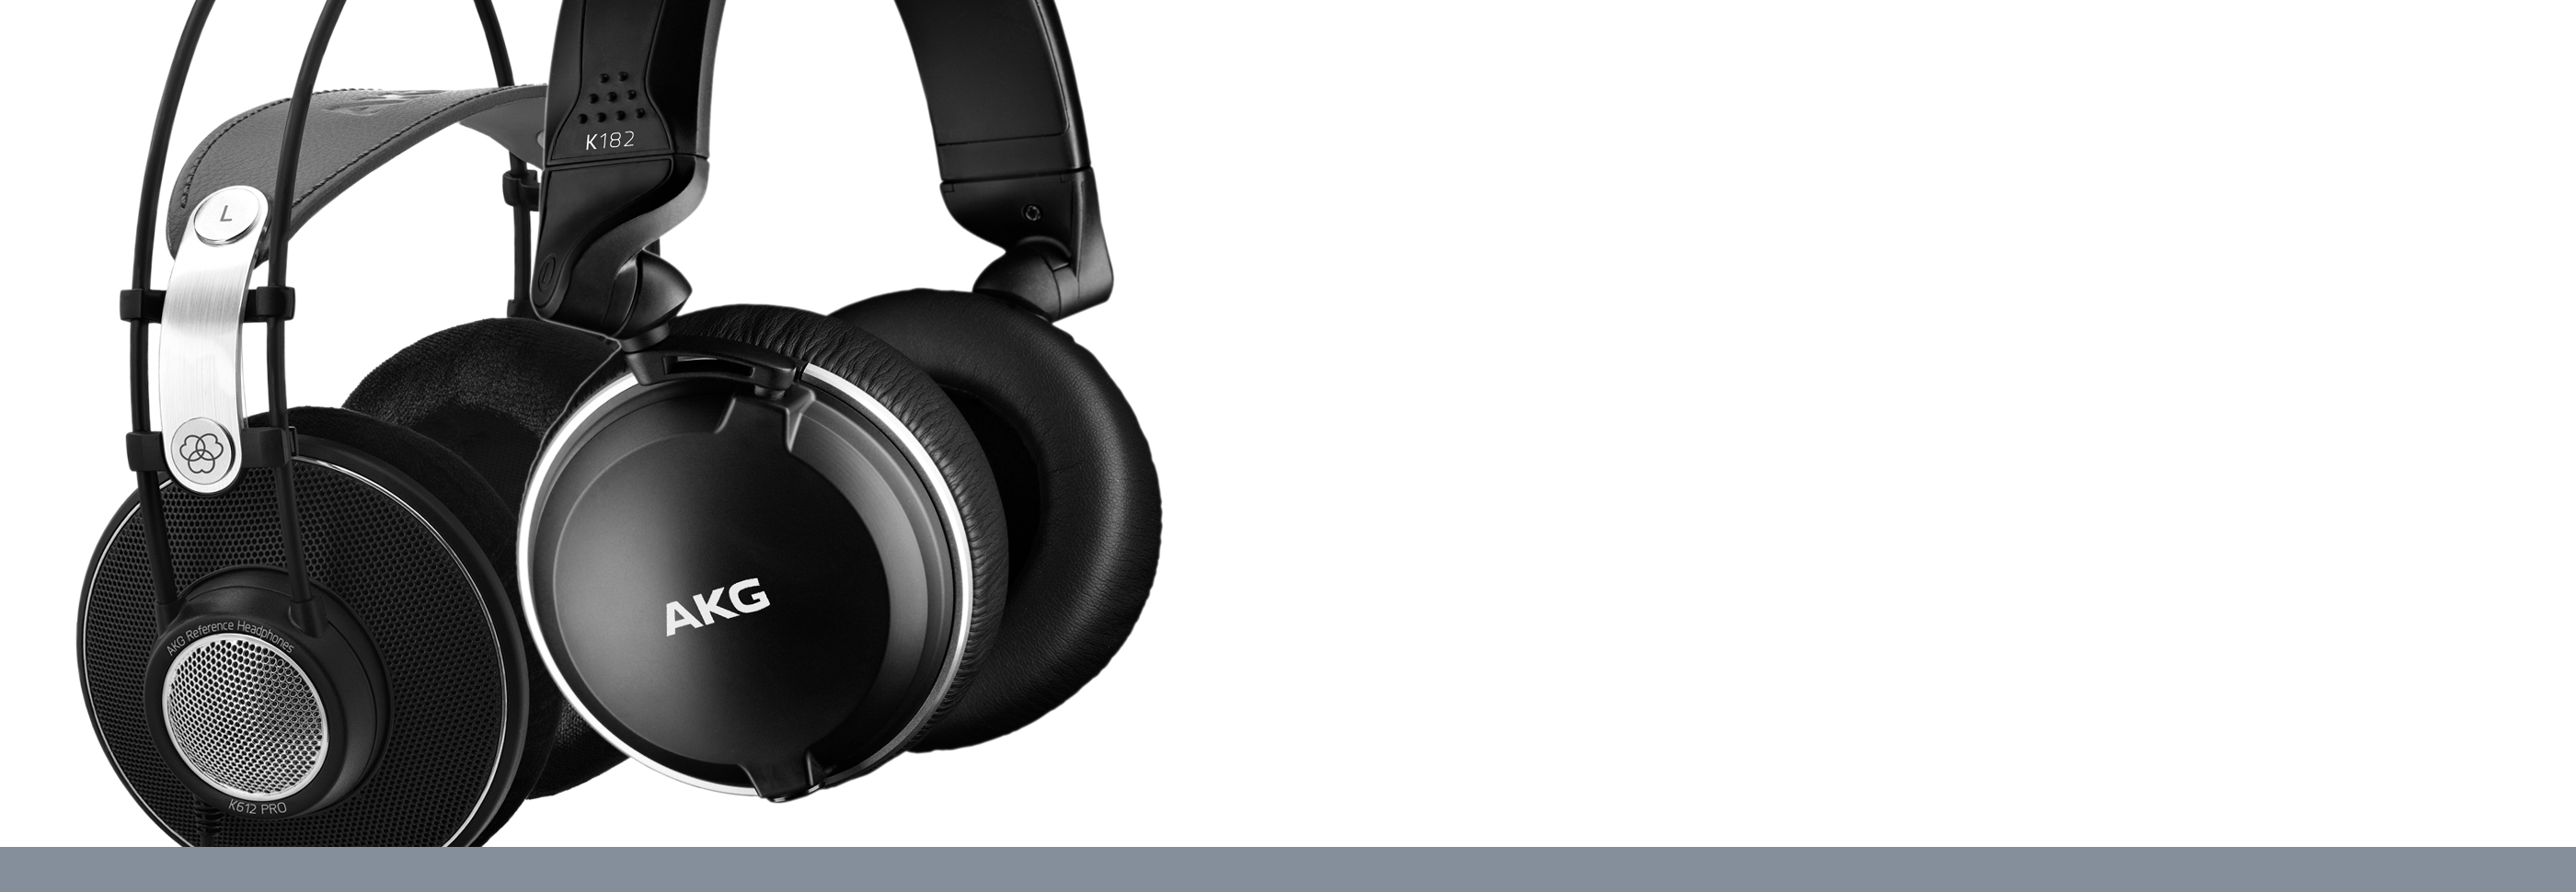 1ac0c01da1d Official AKG Store – Microphones, Headphones, and More!